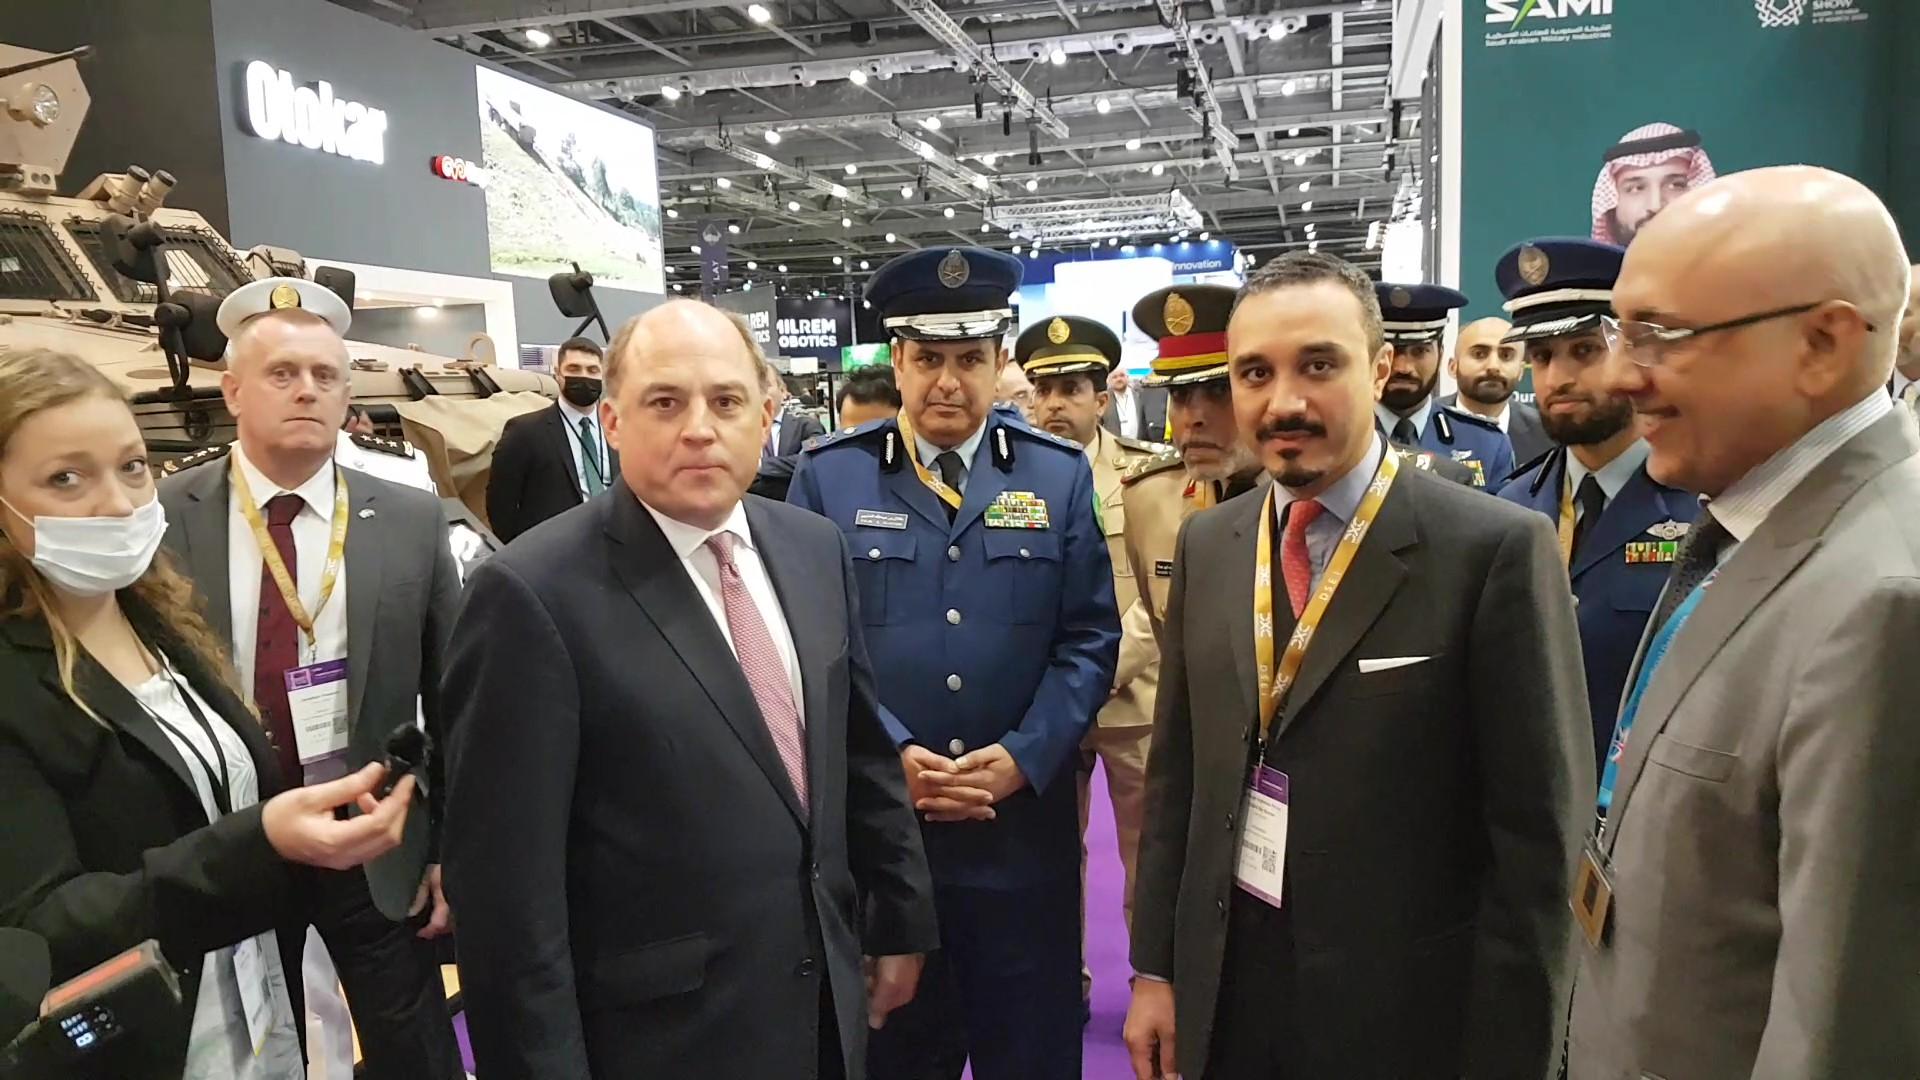 UK defence secretary Ben Wallace and Saudi ambassador to the UK Khalid bin Bandar at the DSEI arms fair in London, 15 September 2021. (Photo: Phil Miller / Declassified UK)